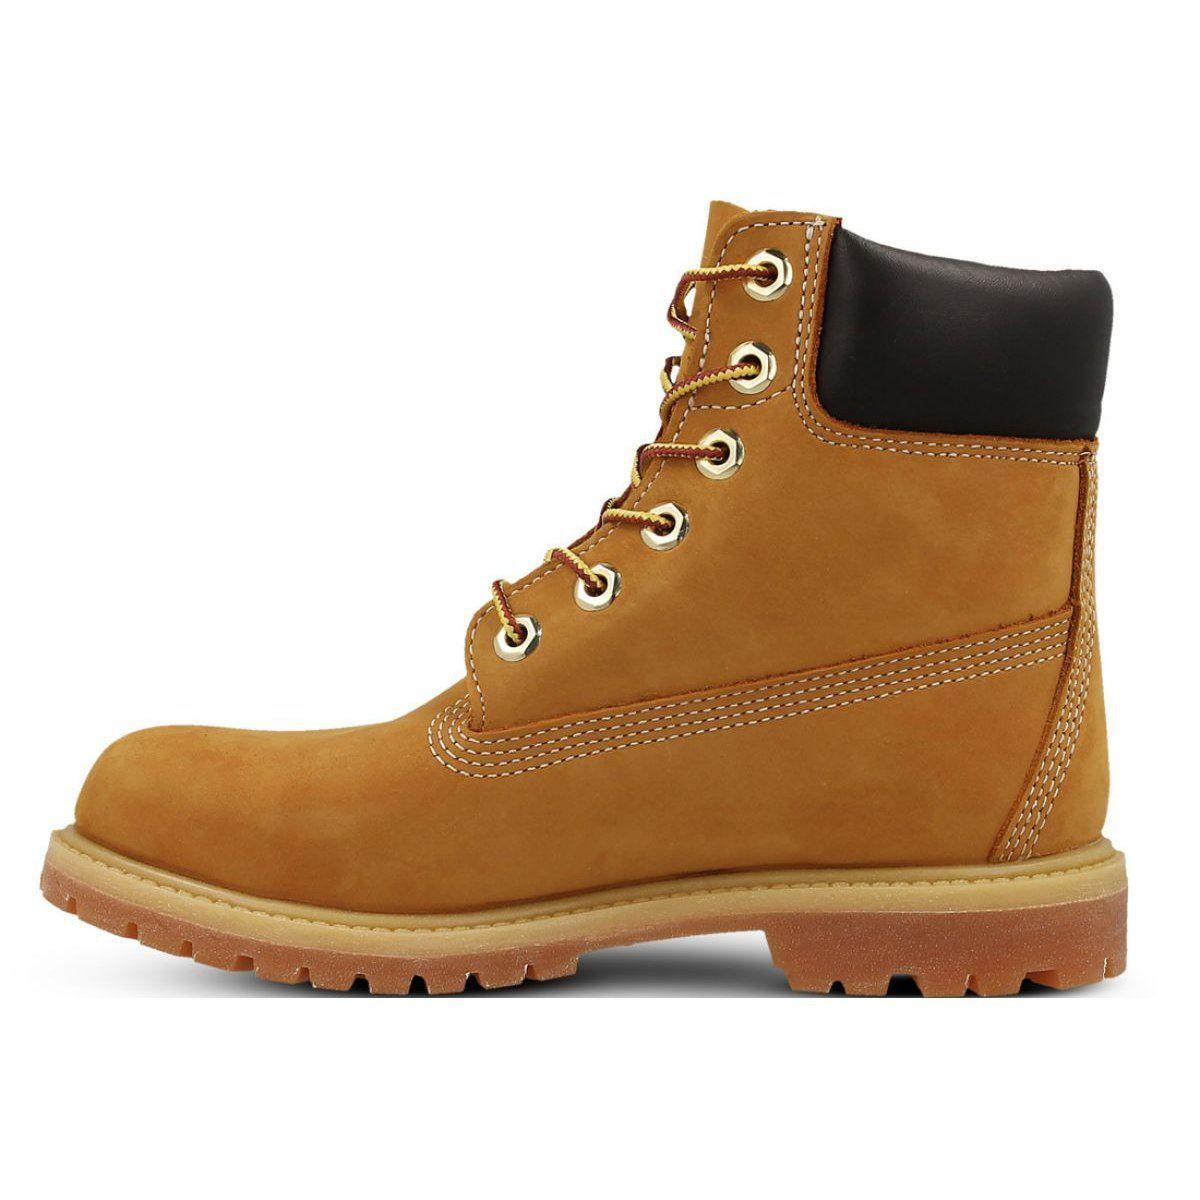 Buty Timberland Premium 6 Inch Jr 10361 Zolte Timberland Shoes Women Timberland Premium Timberland